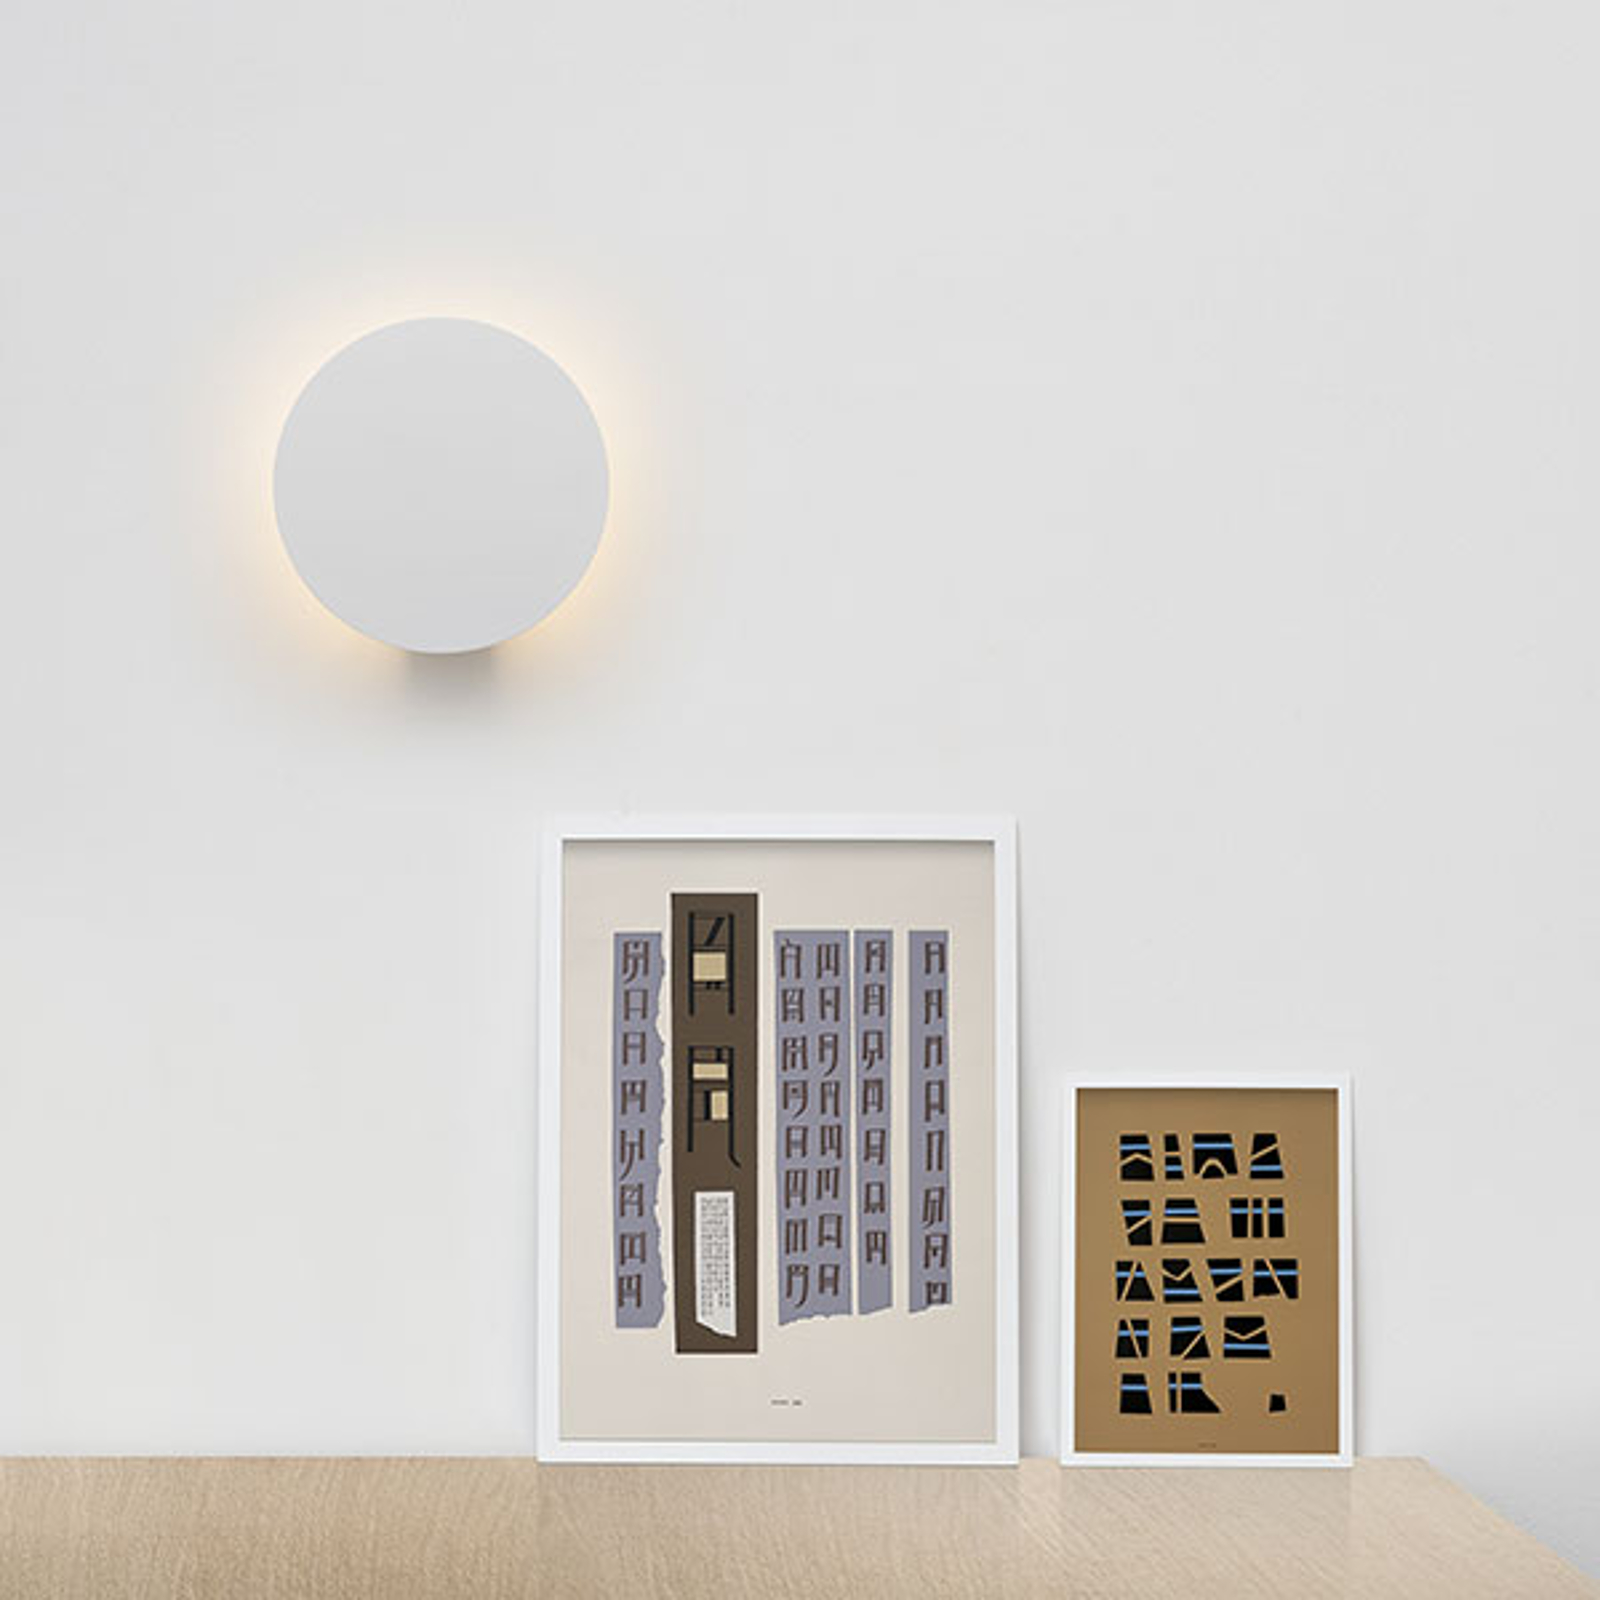 Acquista Rotaliana Collide applique LED